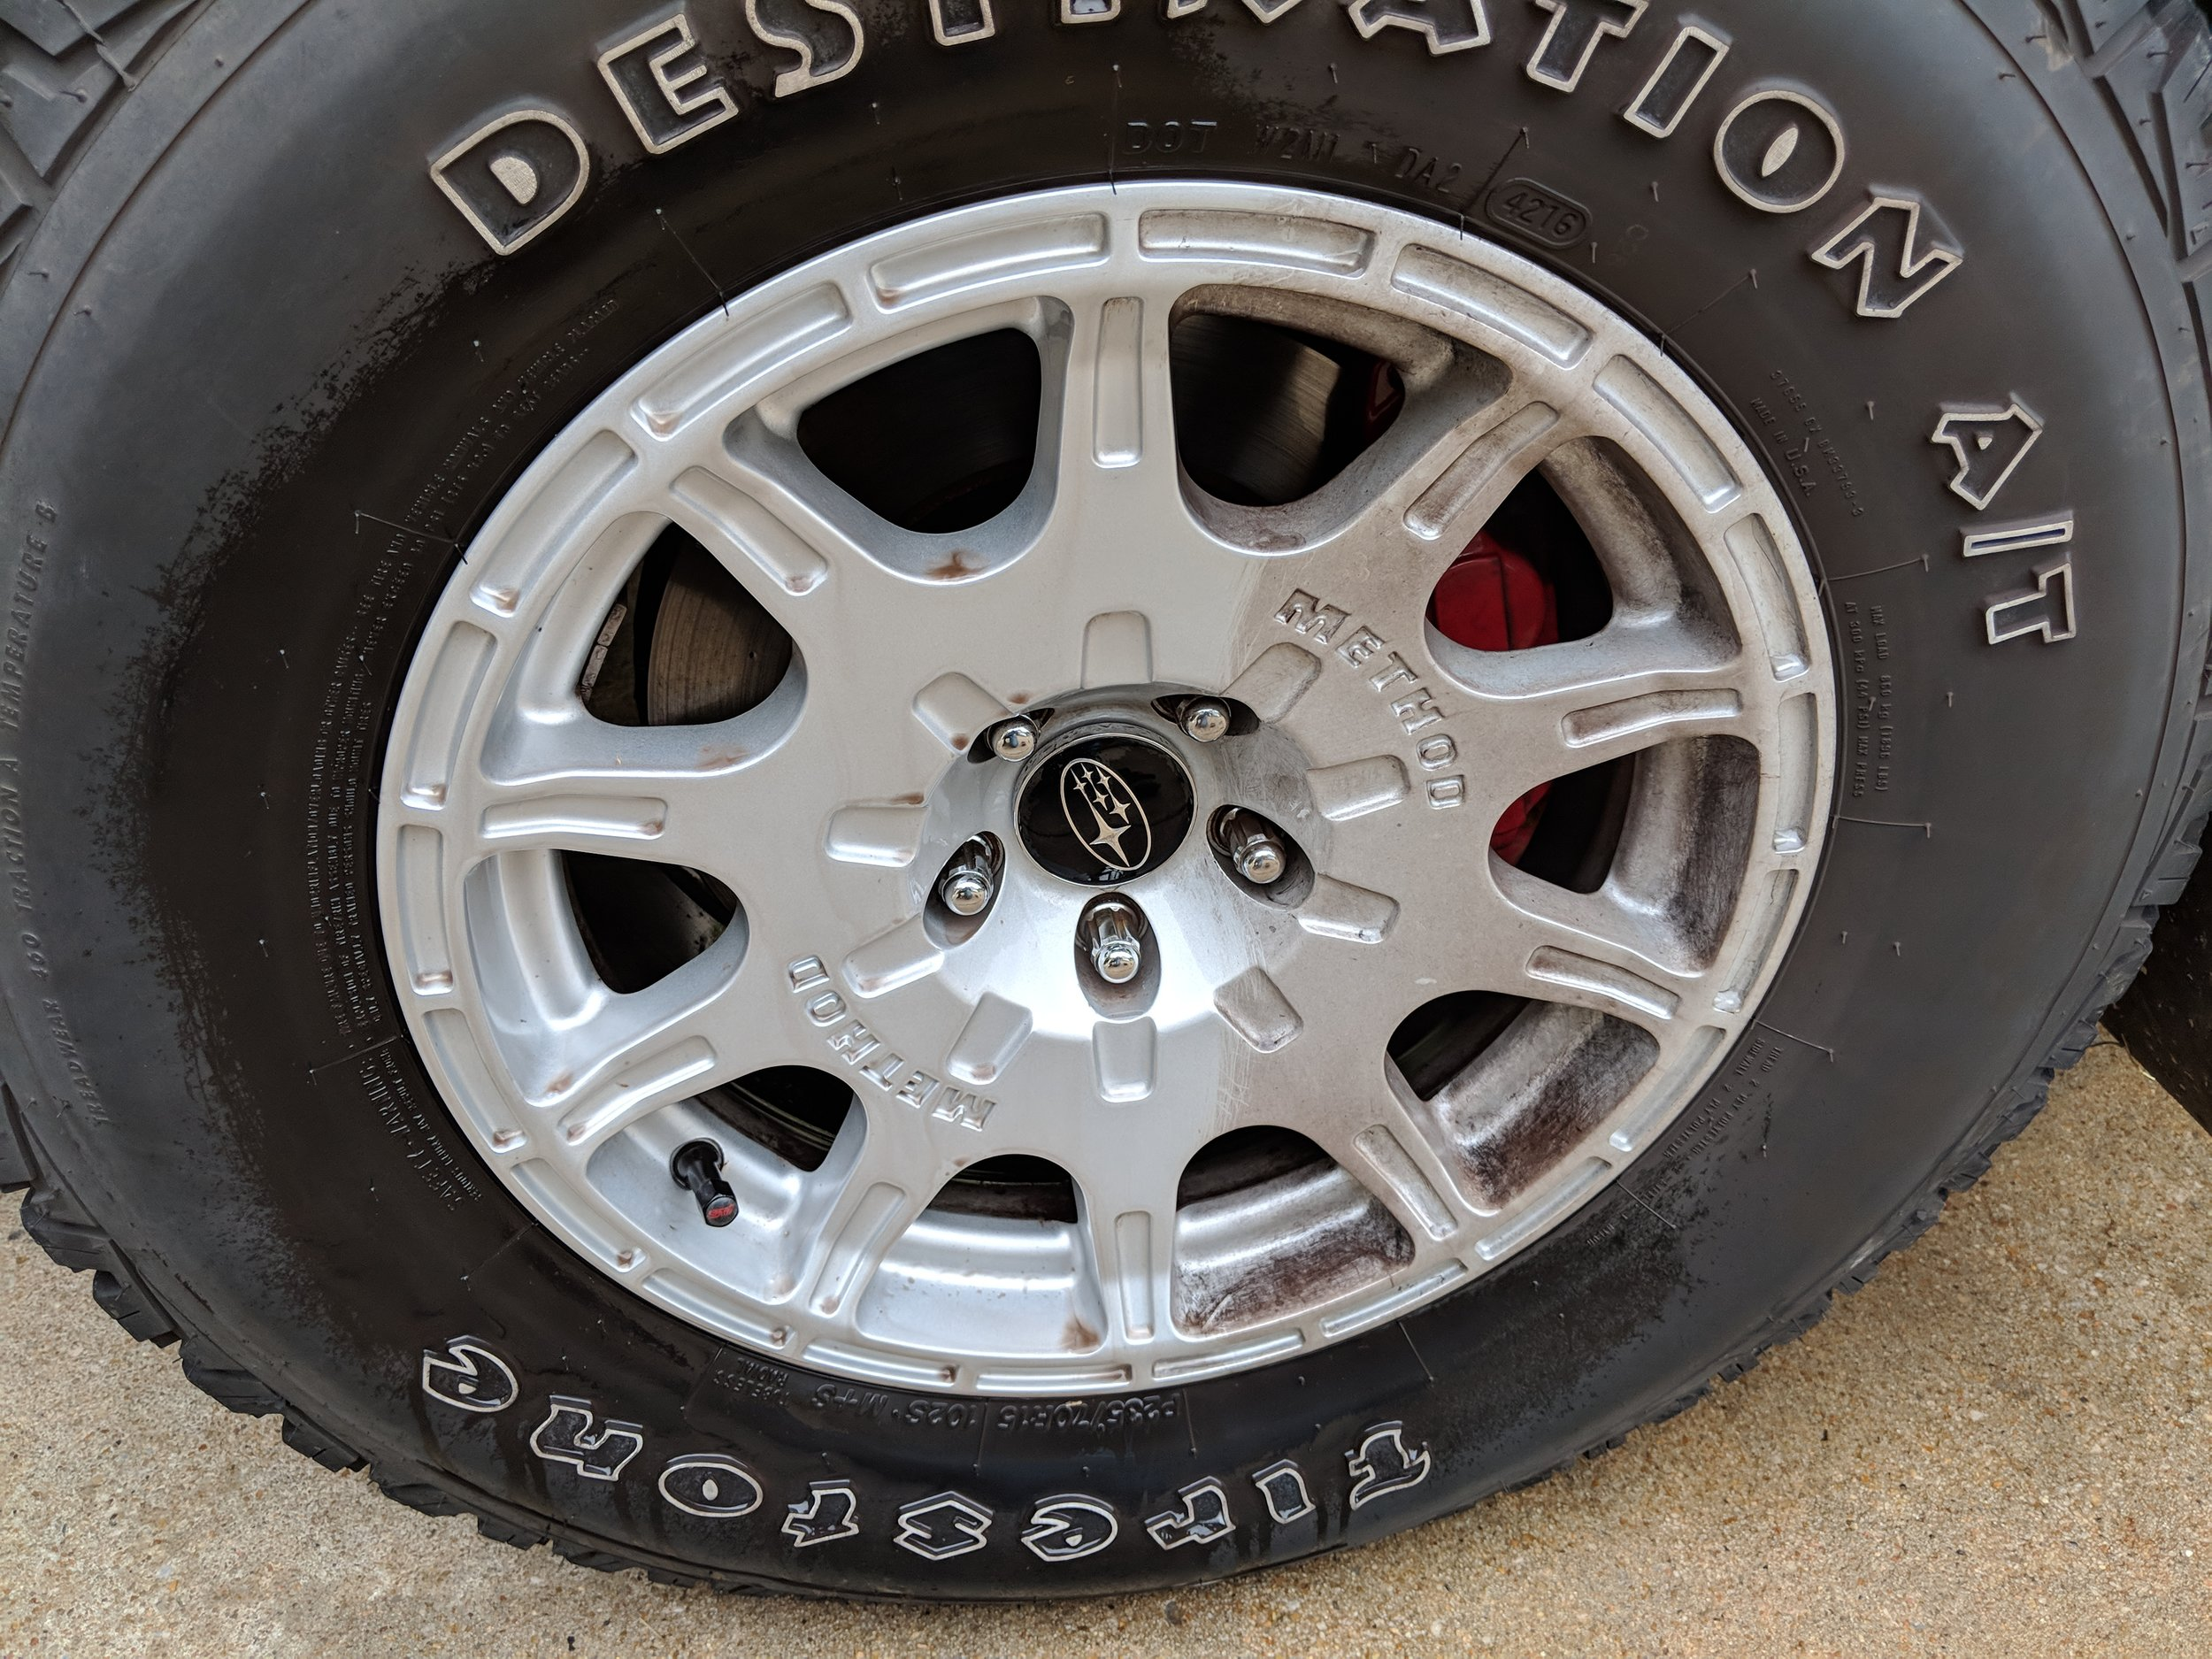 fxt dirty wheel.jpg